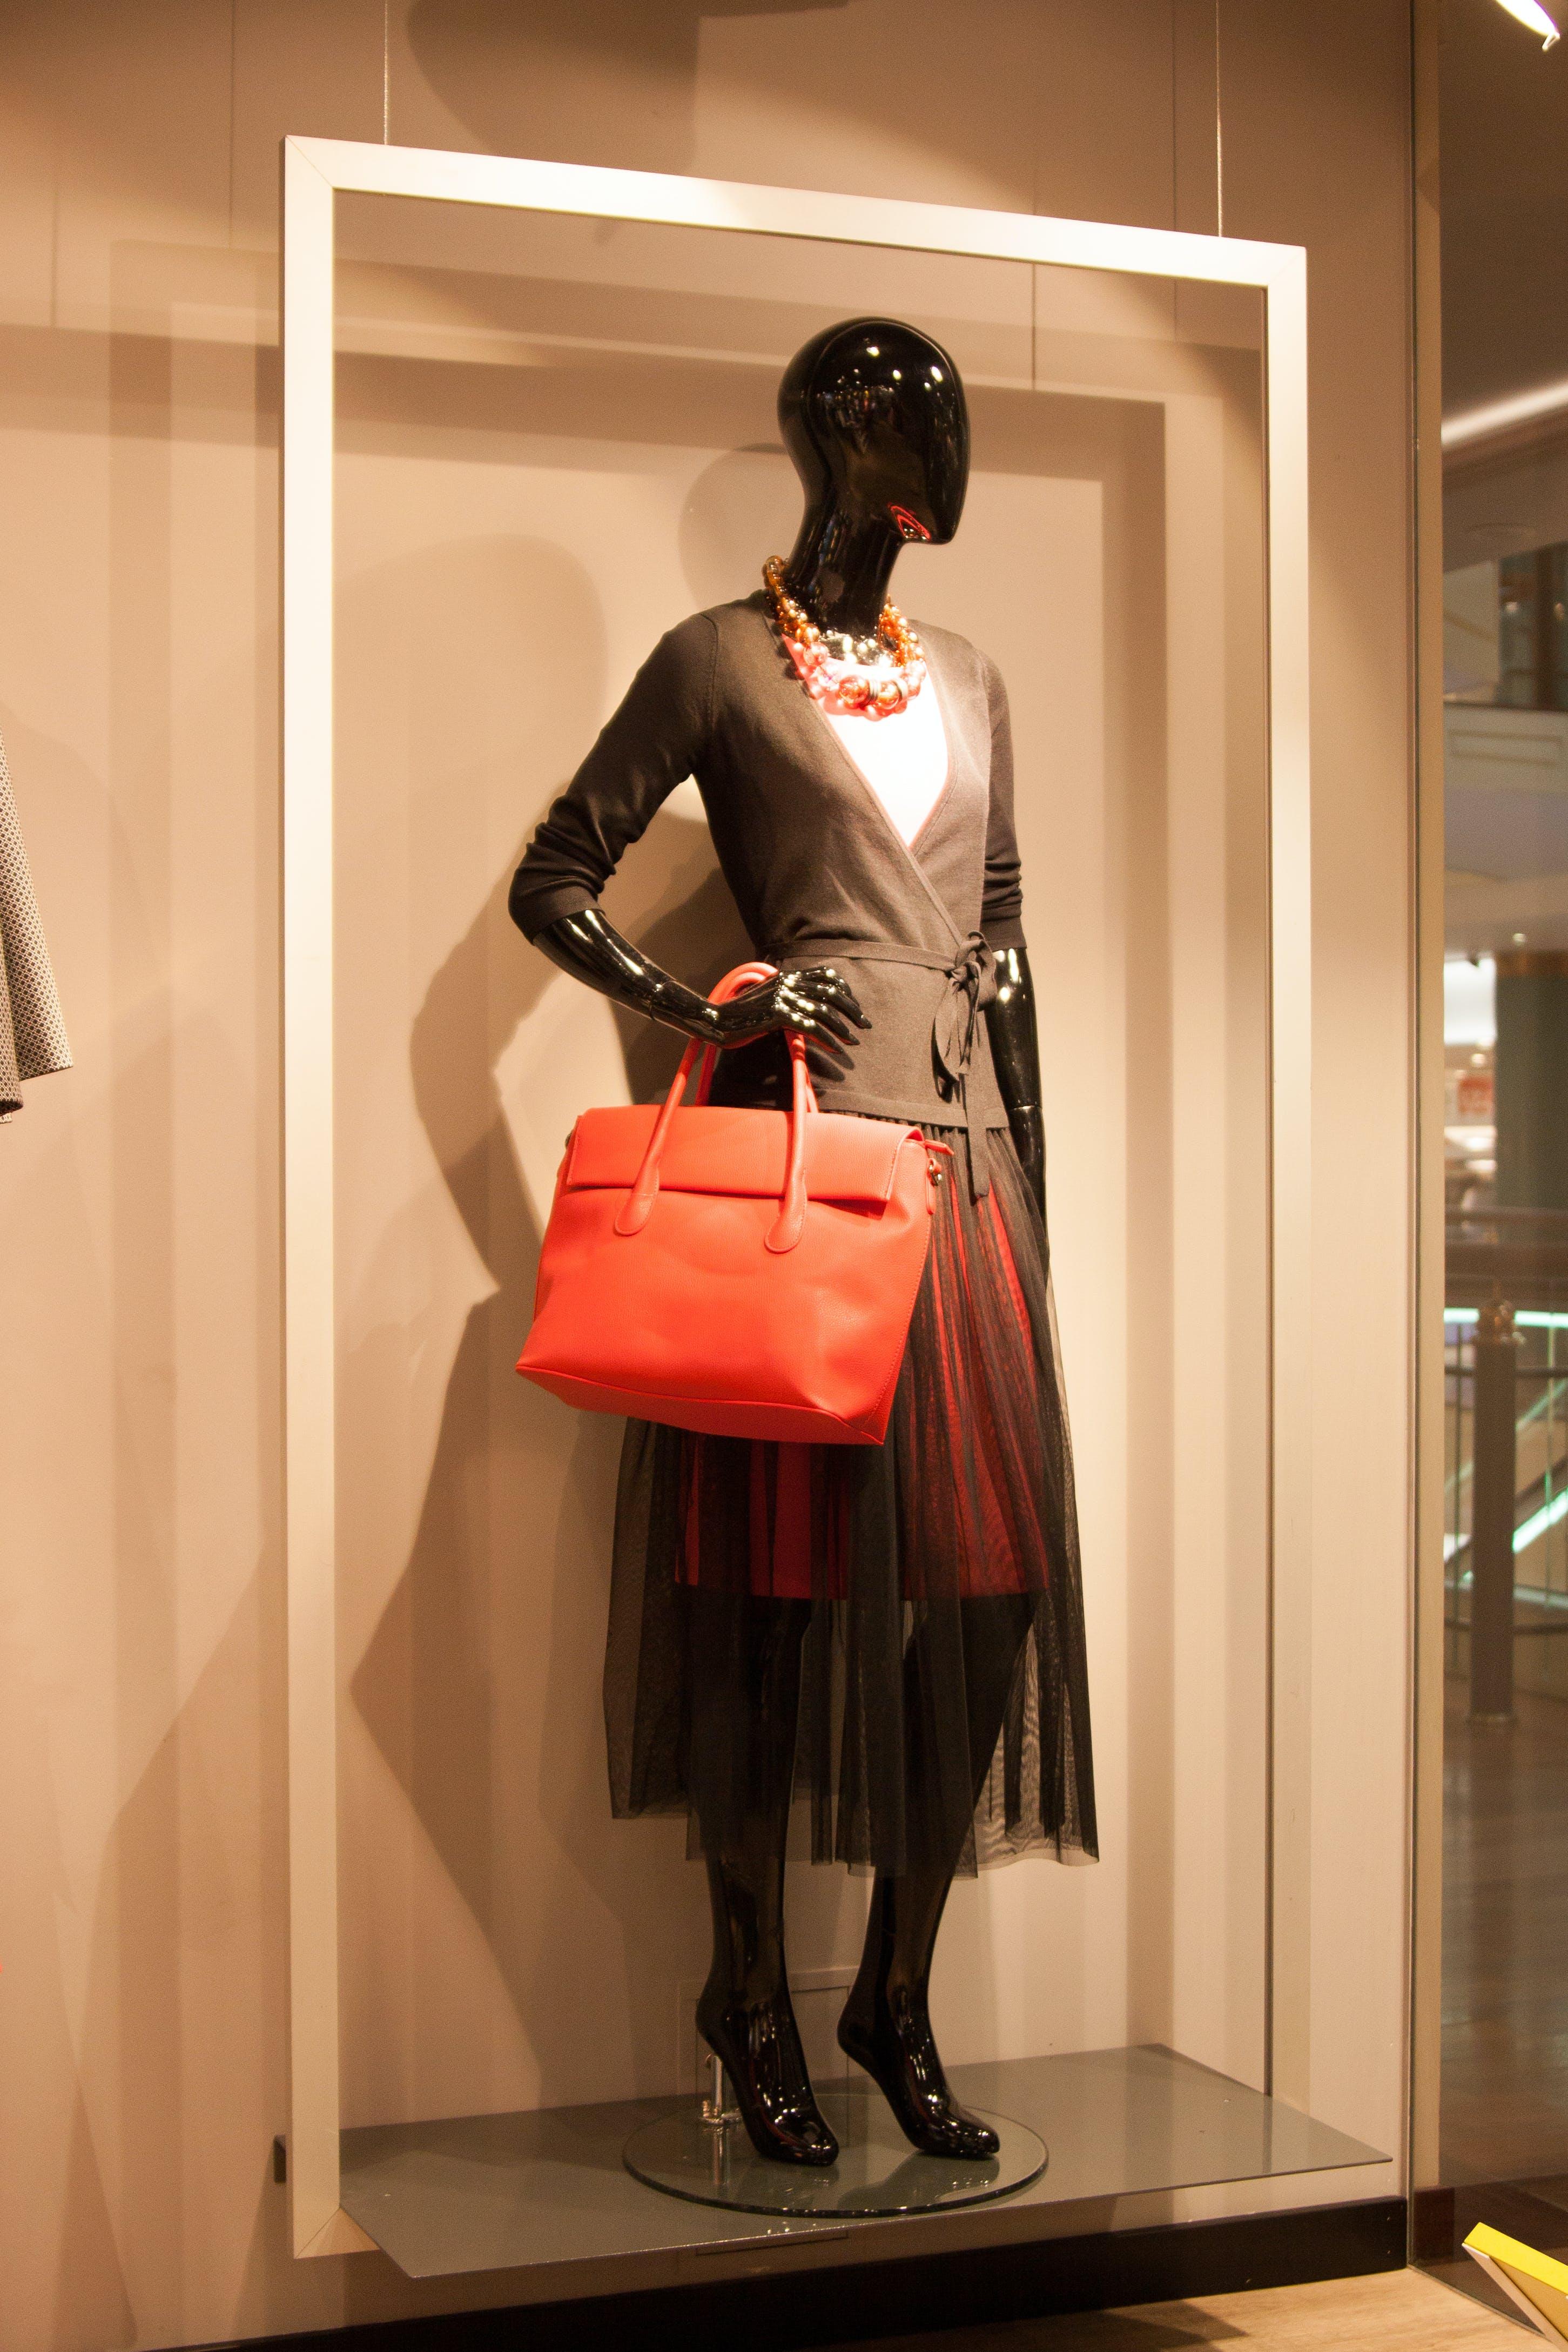 Free stock photo of clothingshop, manequin, woman